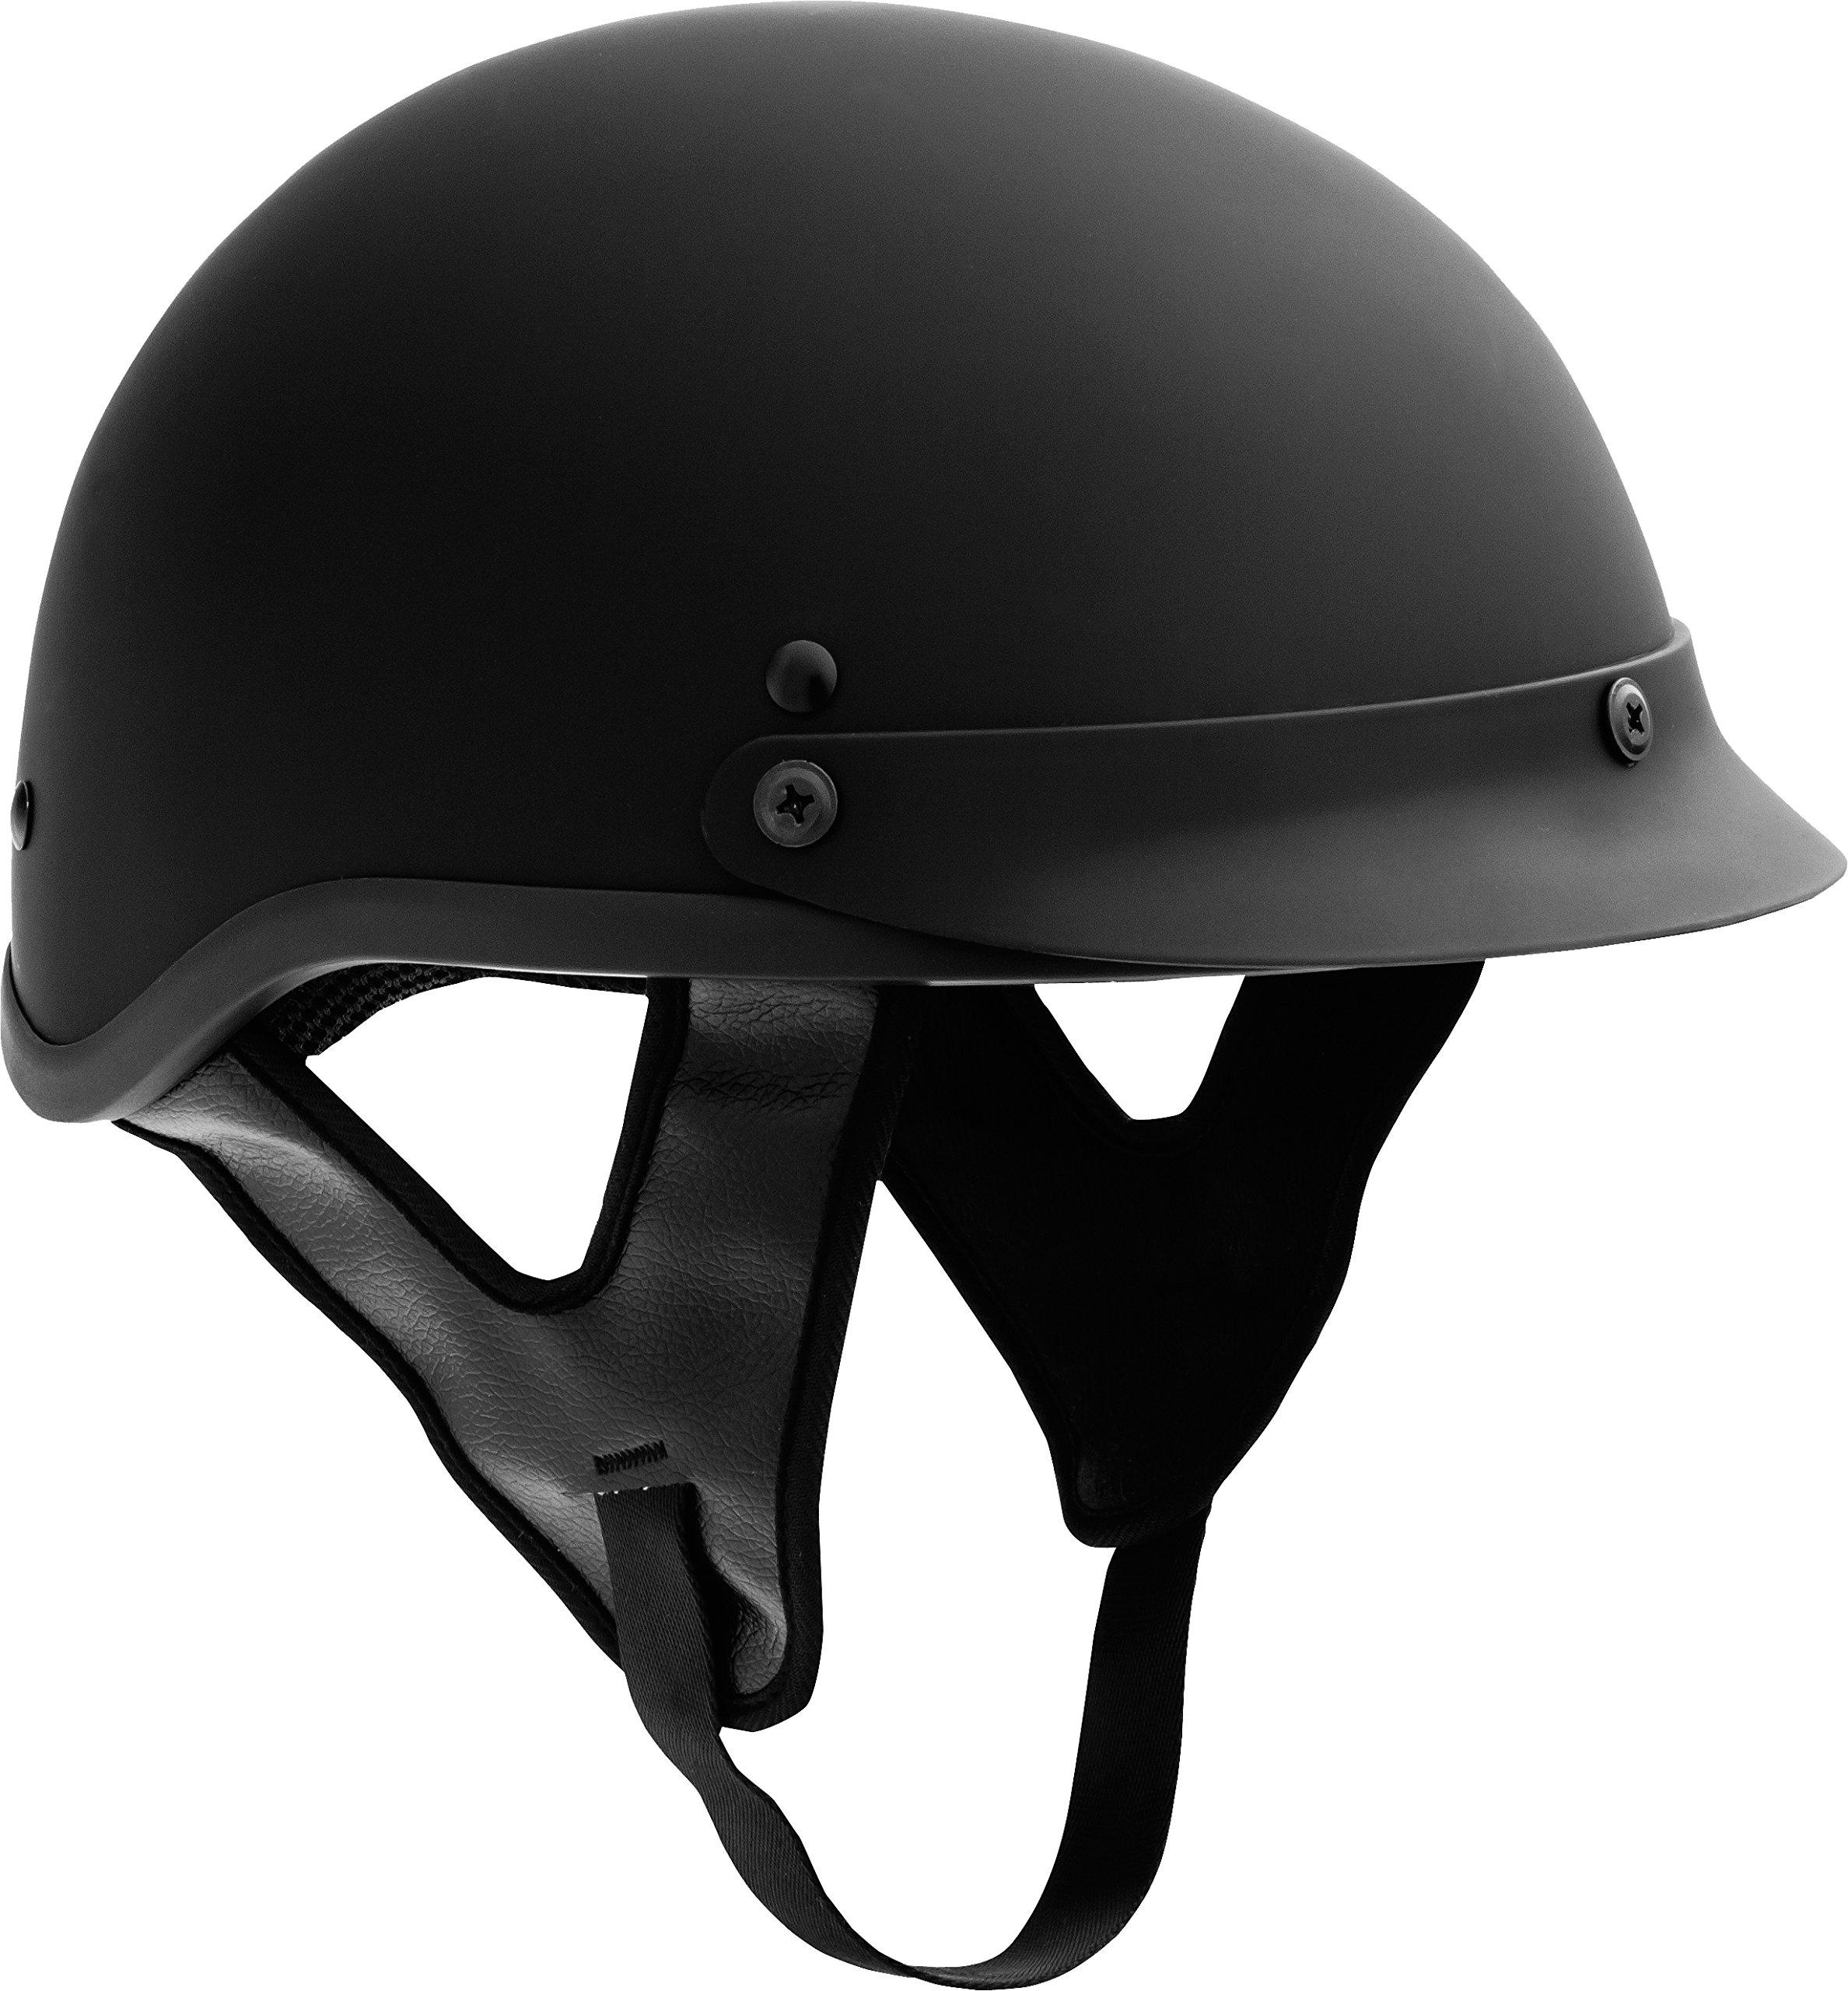 Fuel Helmets SH-HHFL67 HH Series Half Helmet, Flat Black, X-Large by Fuel Helmets